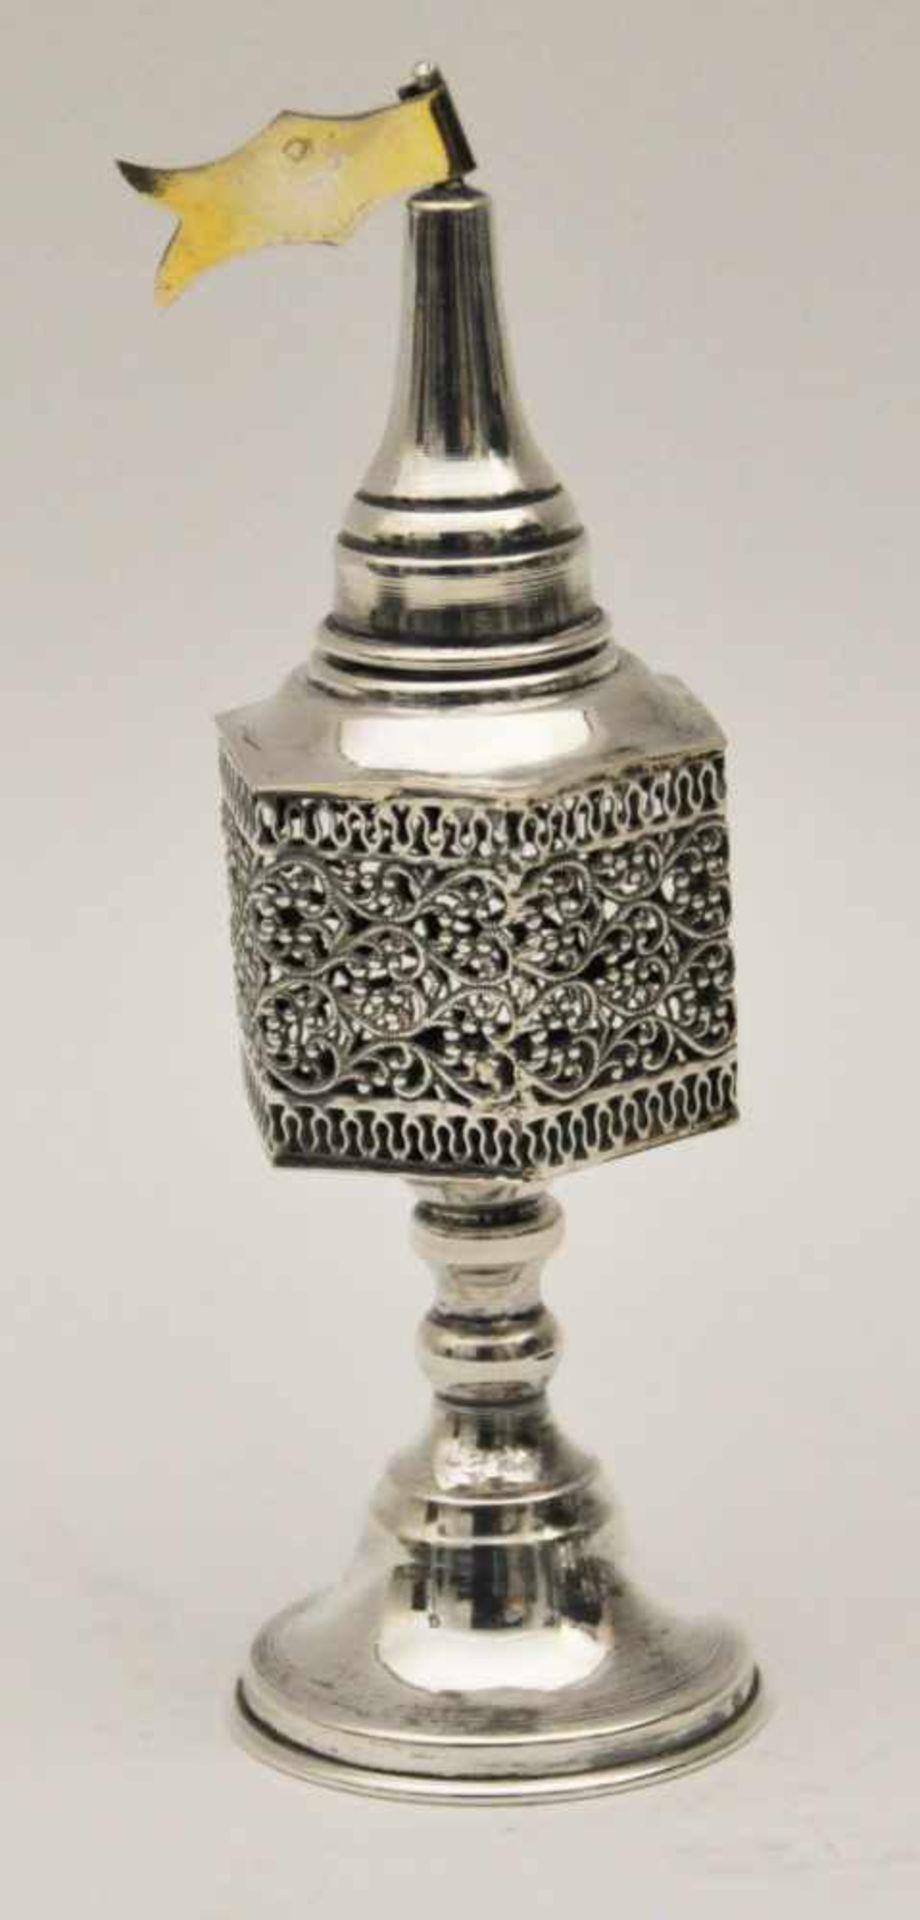 Besamin Türmchen, Deutsch 20. Jh.Silber Nelken Behälter, 925 Silber, Gewicht 33 g